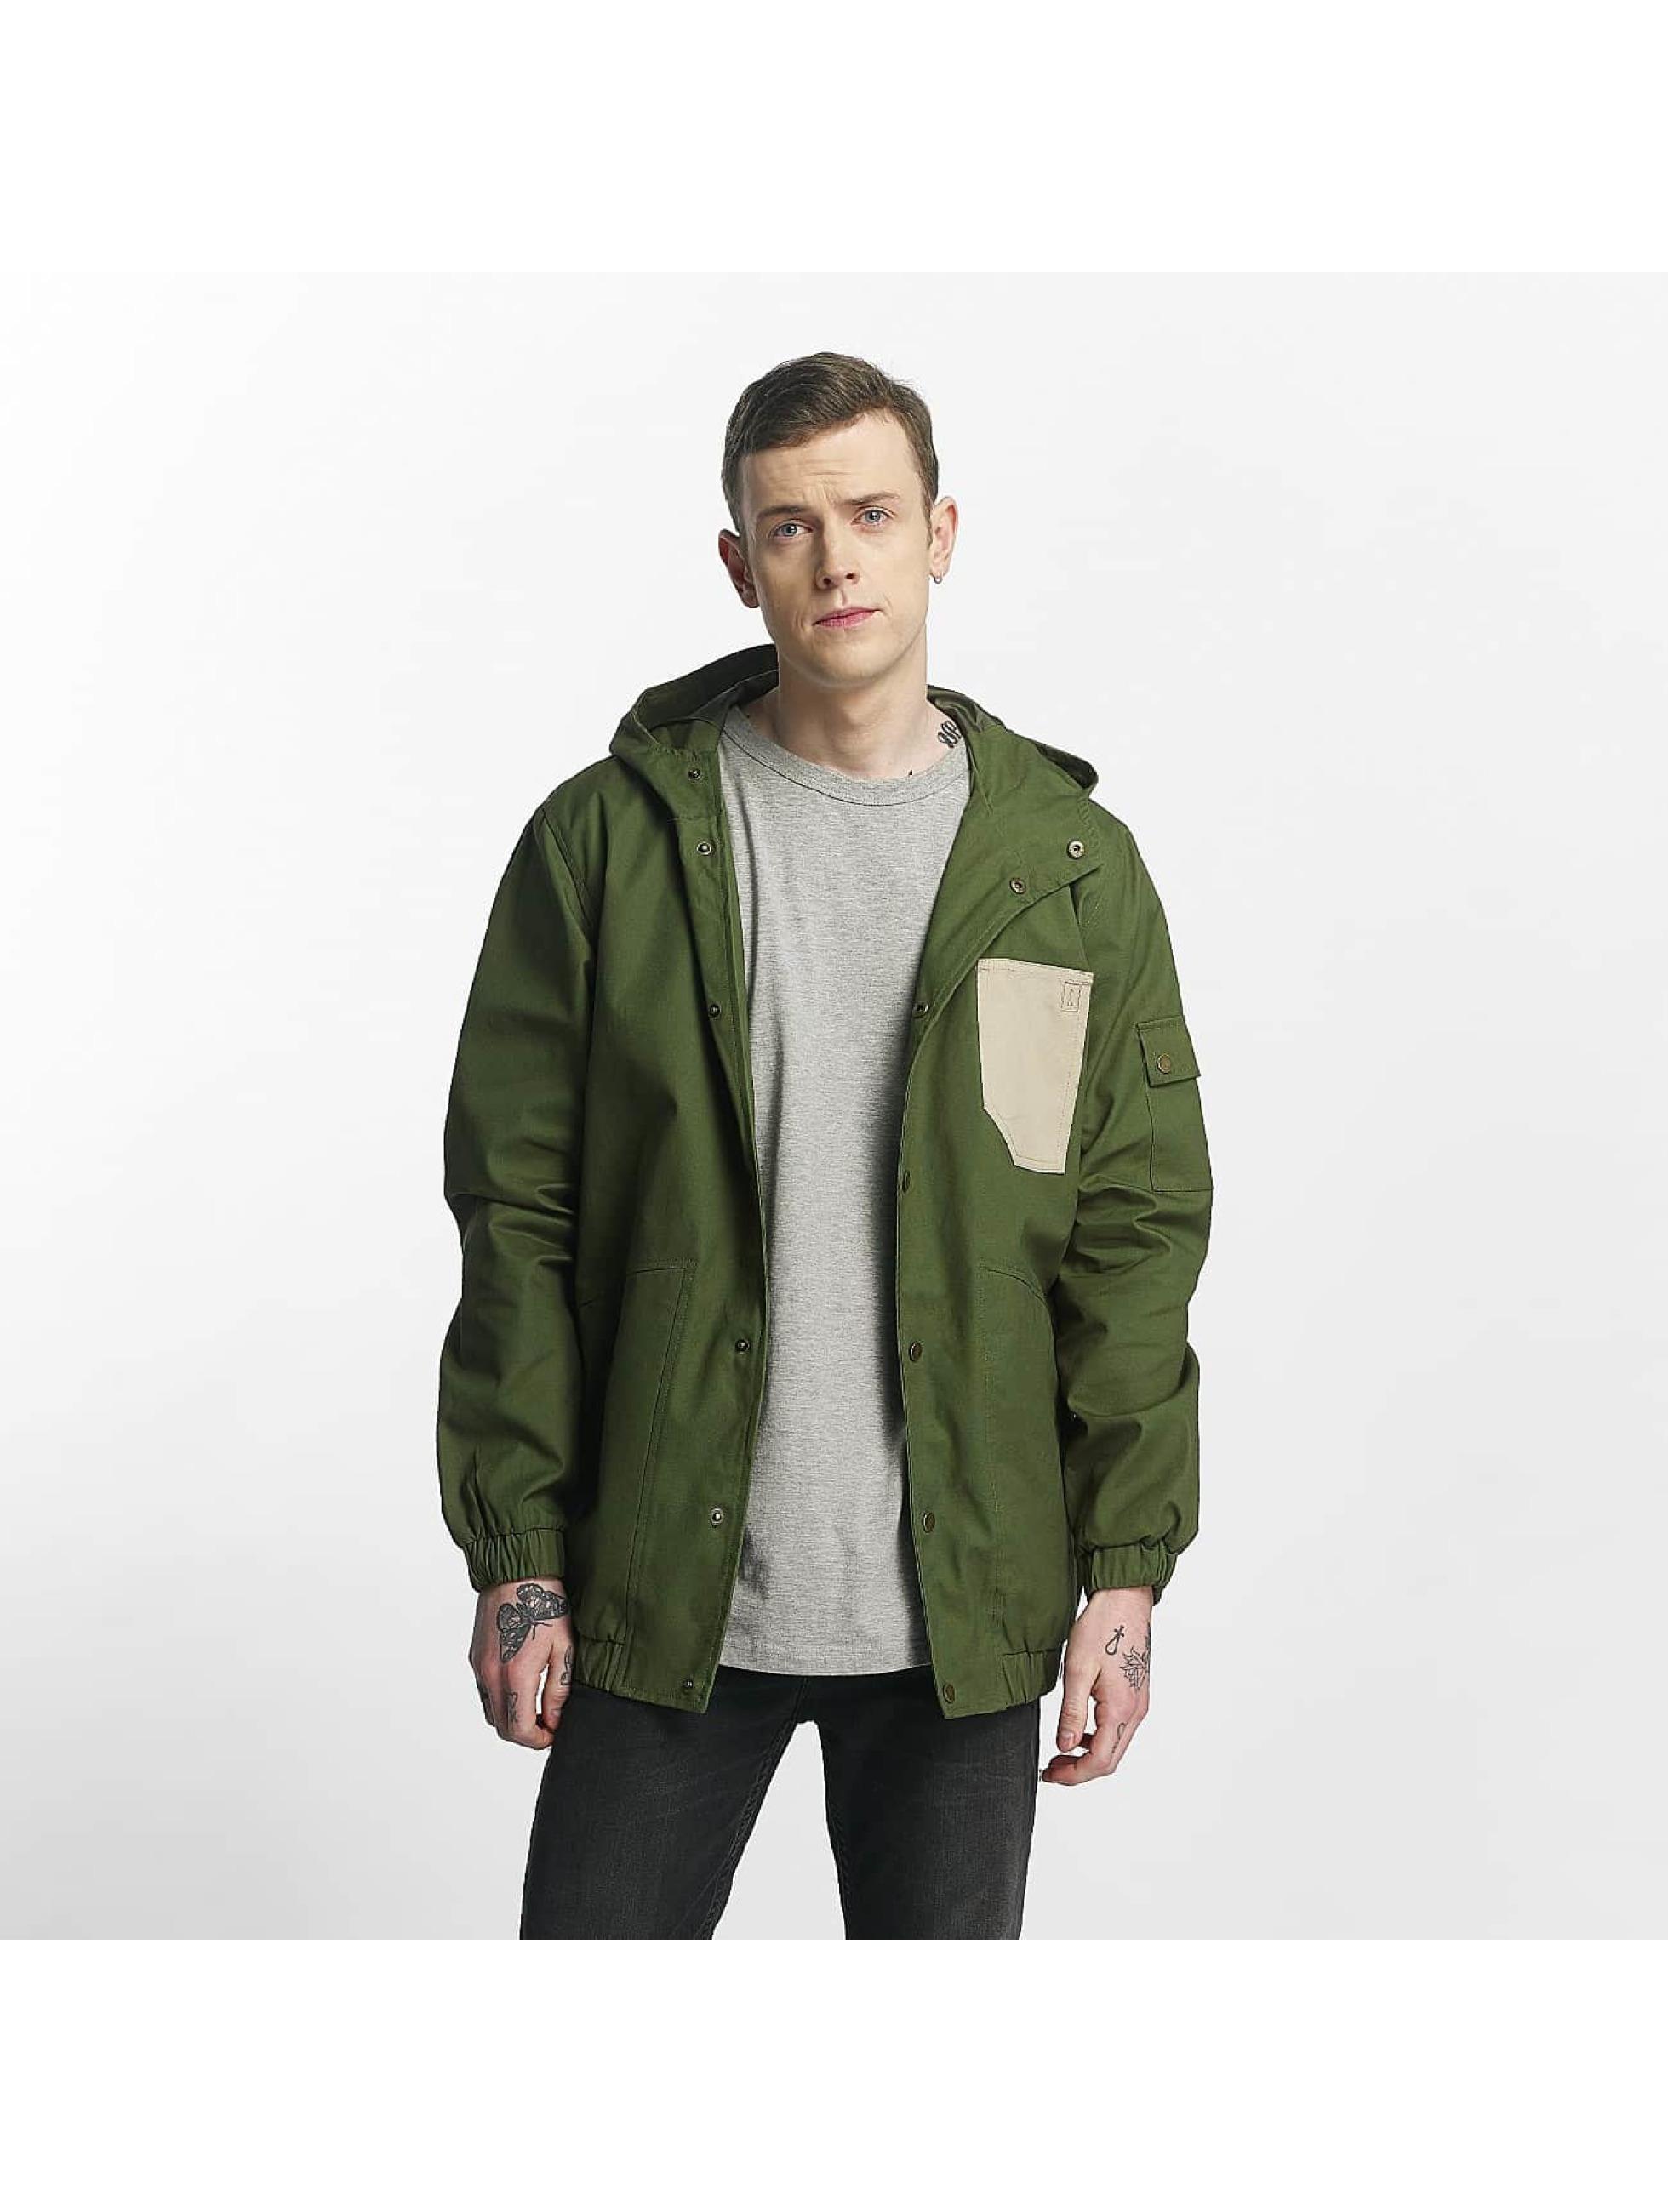 Cyprime / Lightweight Jacket Moonstone in olive XL